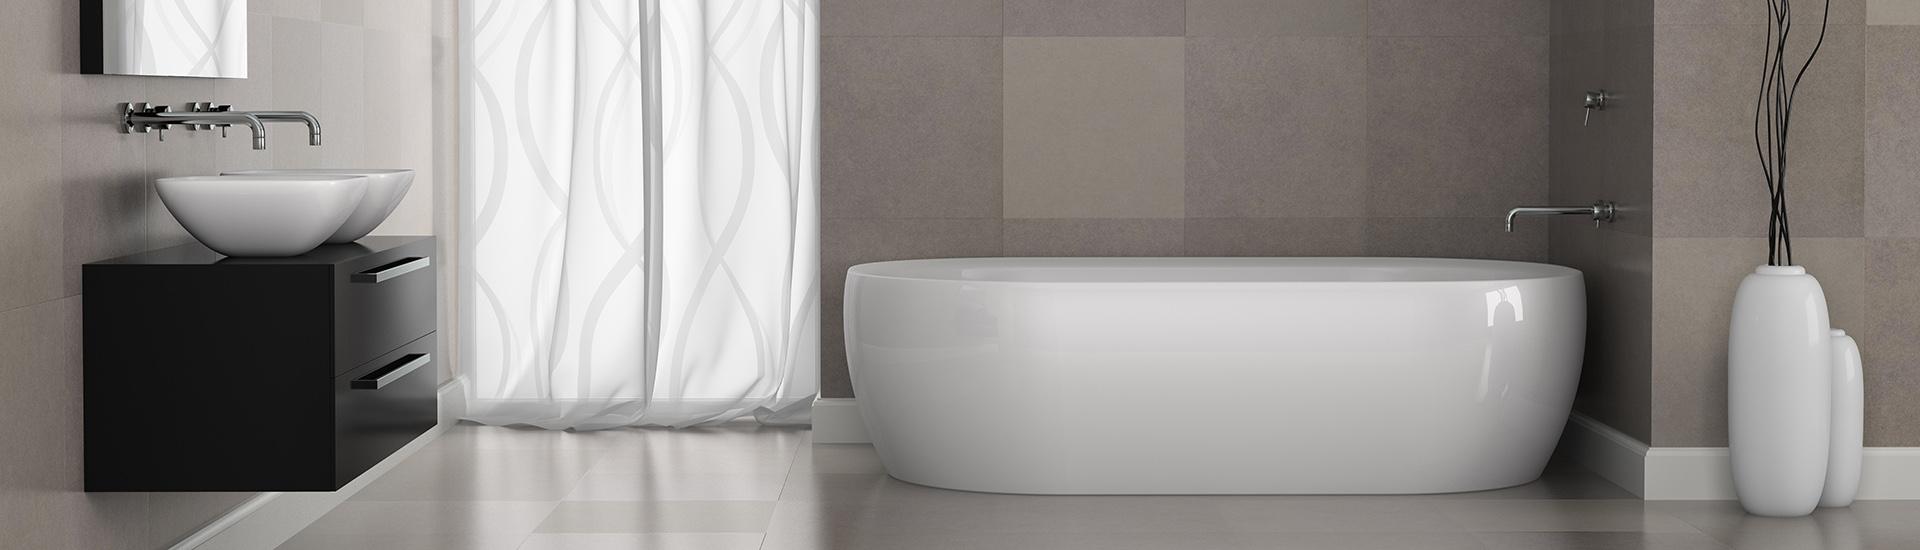 De Ruiter Badkamerbouw | Moderne badkamer